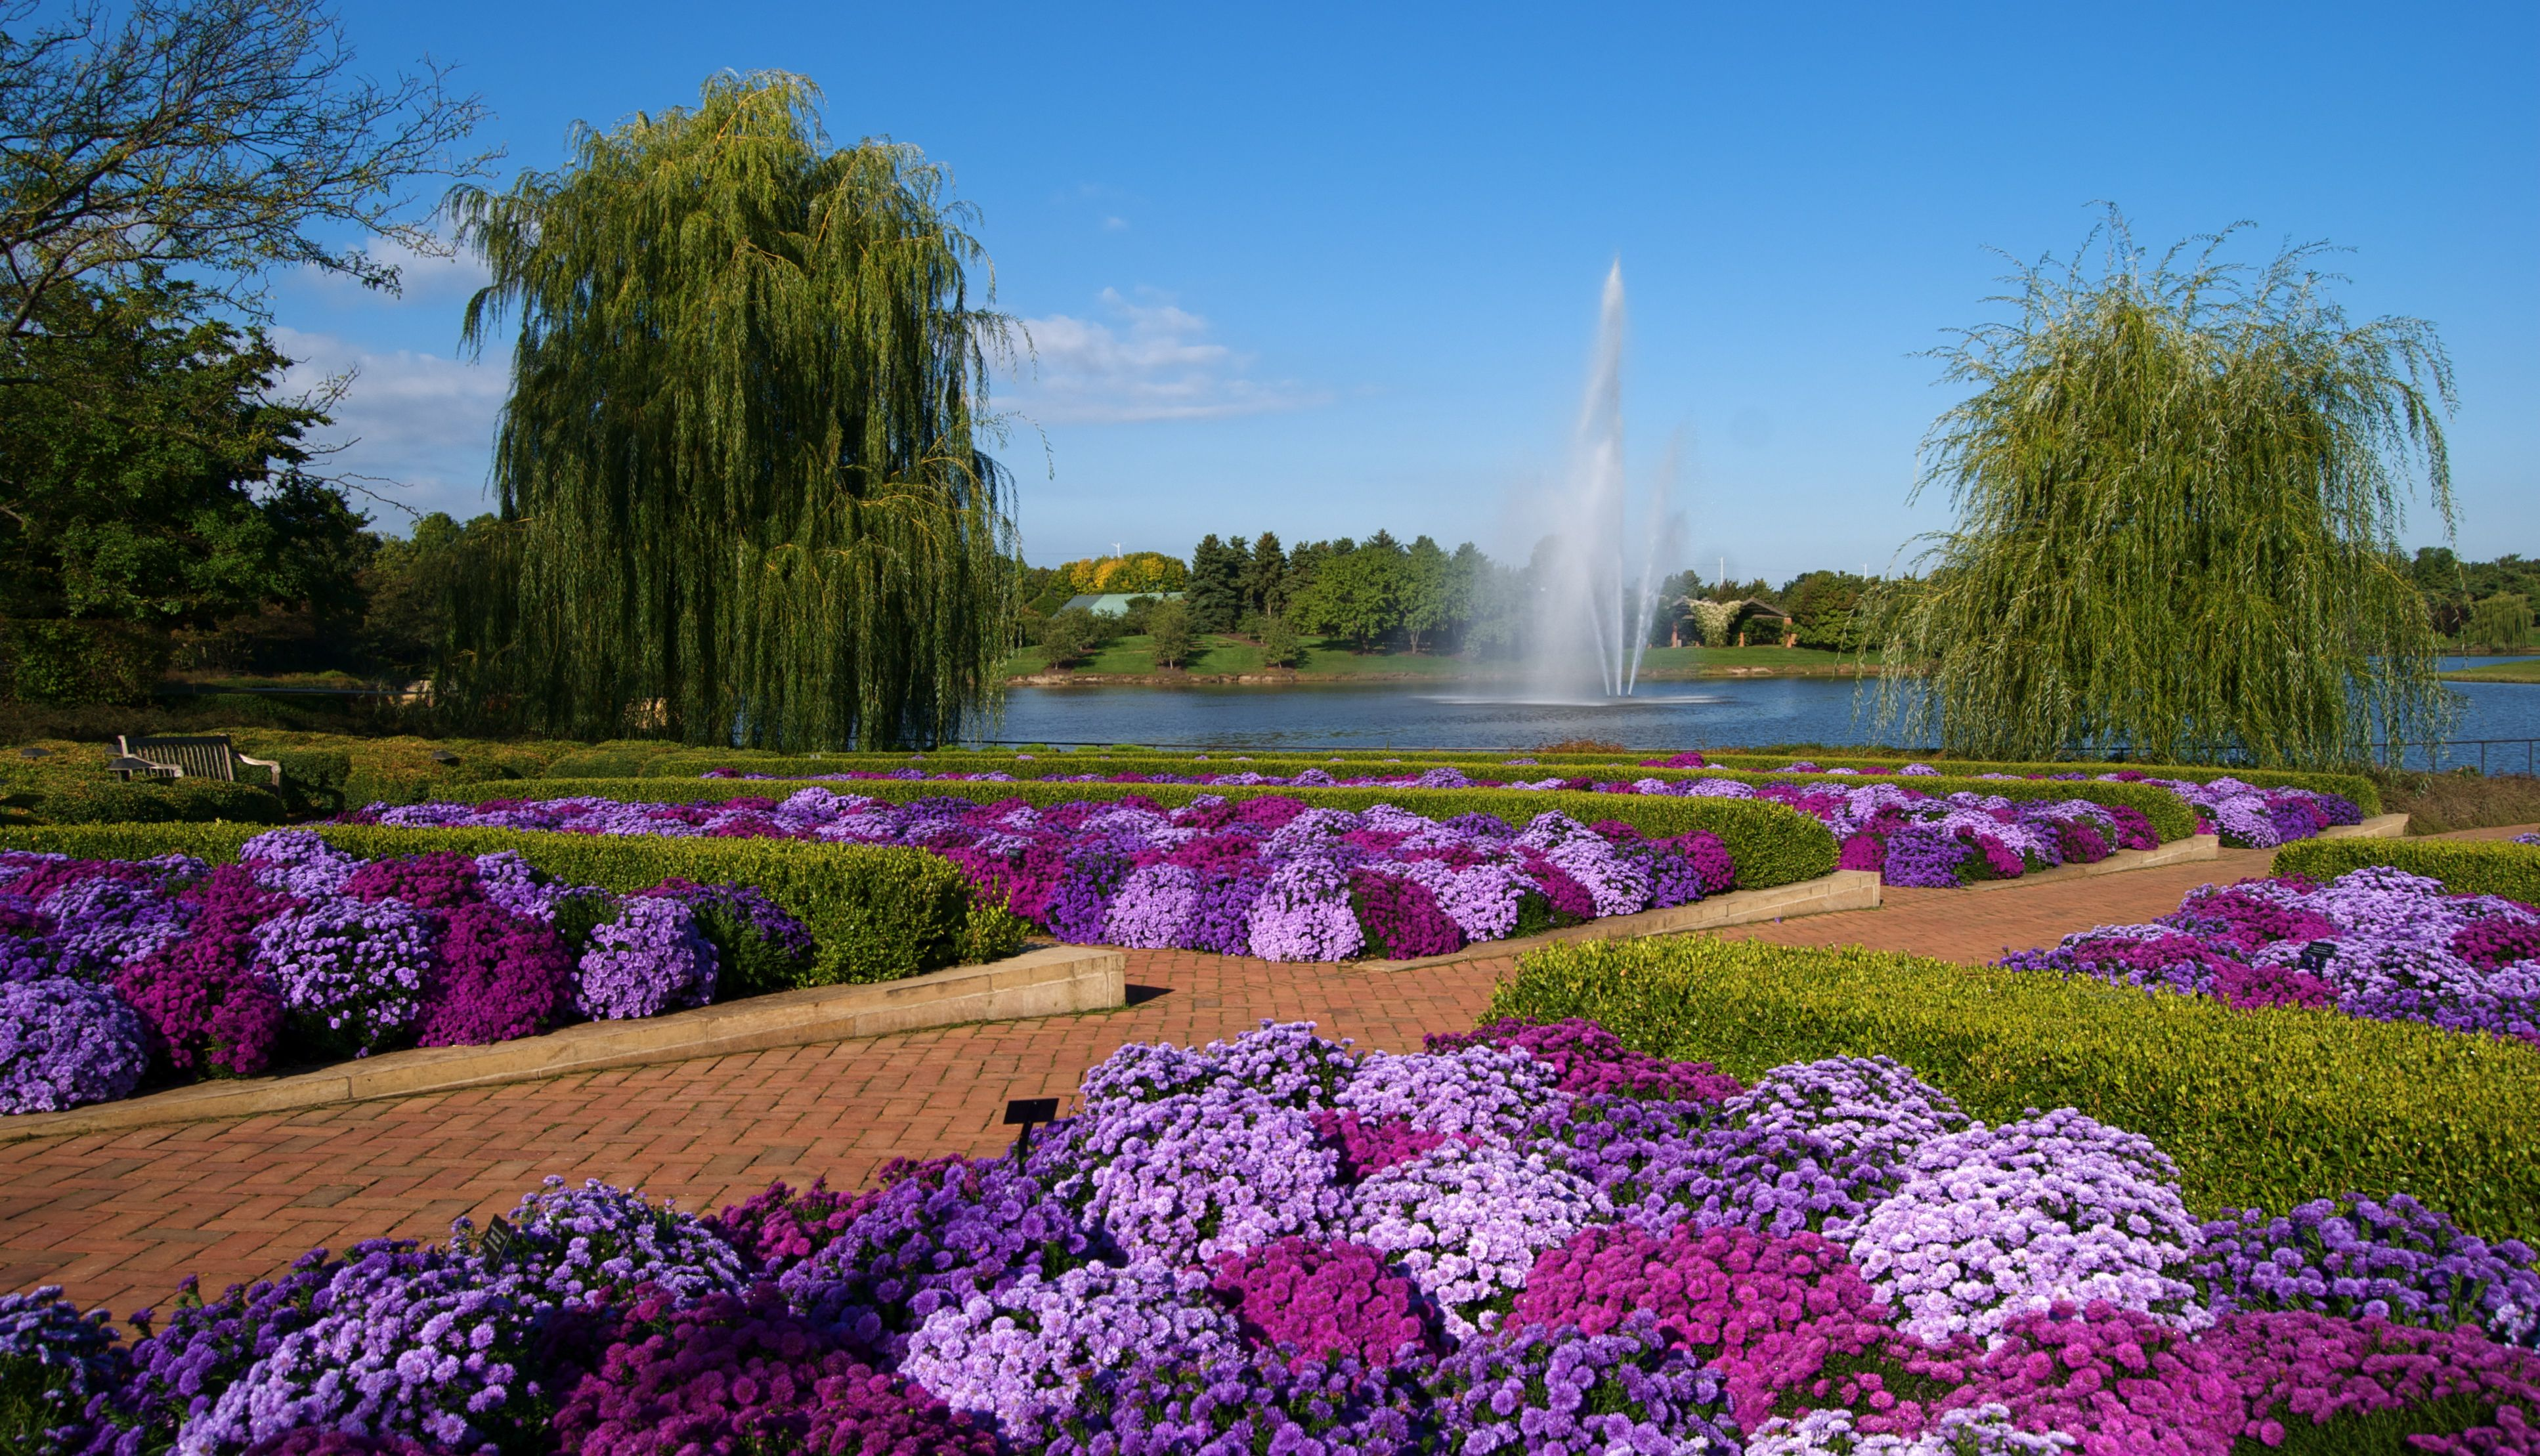 8 Beautiful Virtual Garden Tours To Enjoy While In Isolation